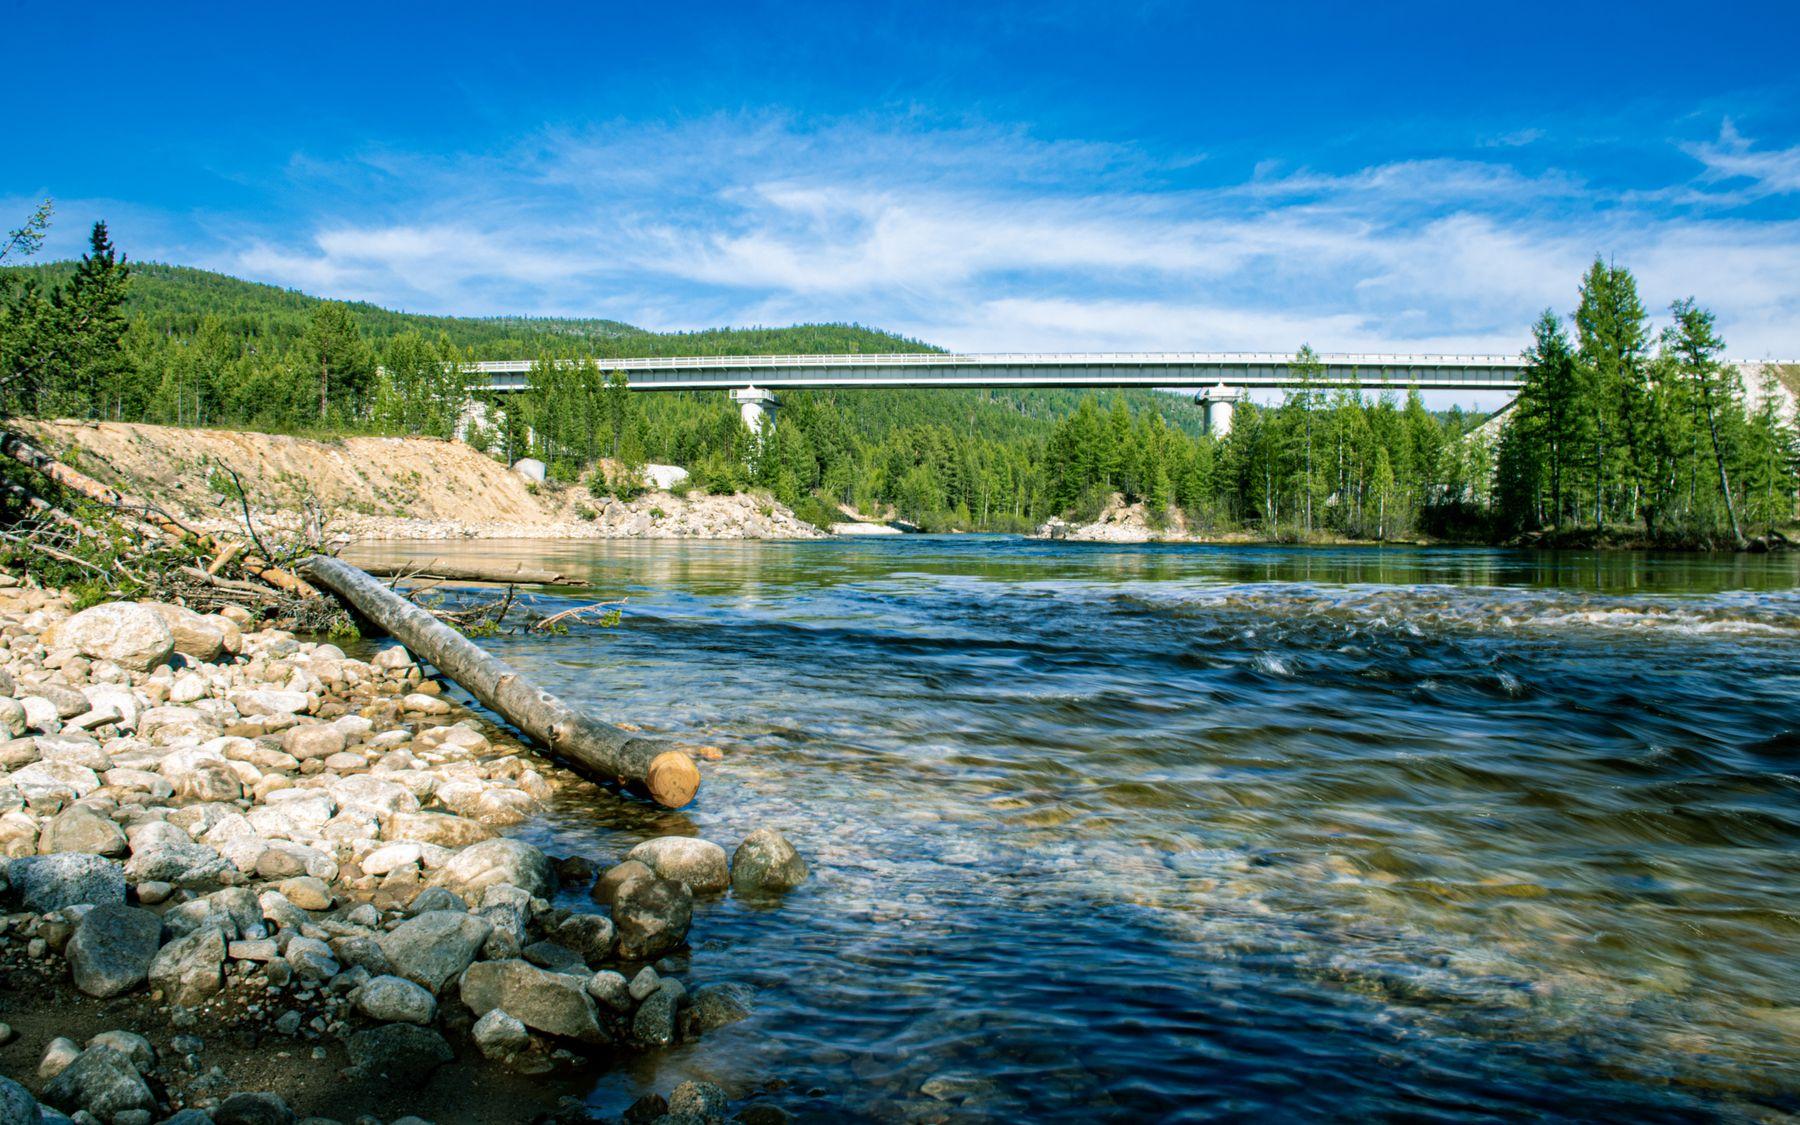 мост через р. Тельмама